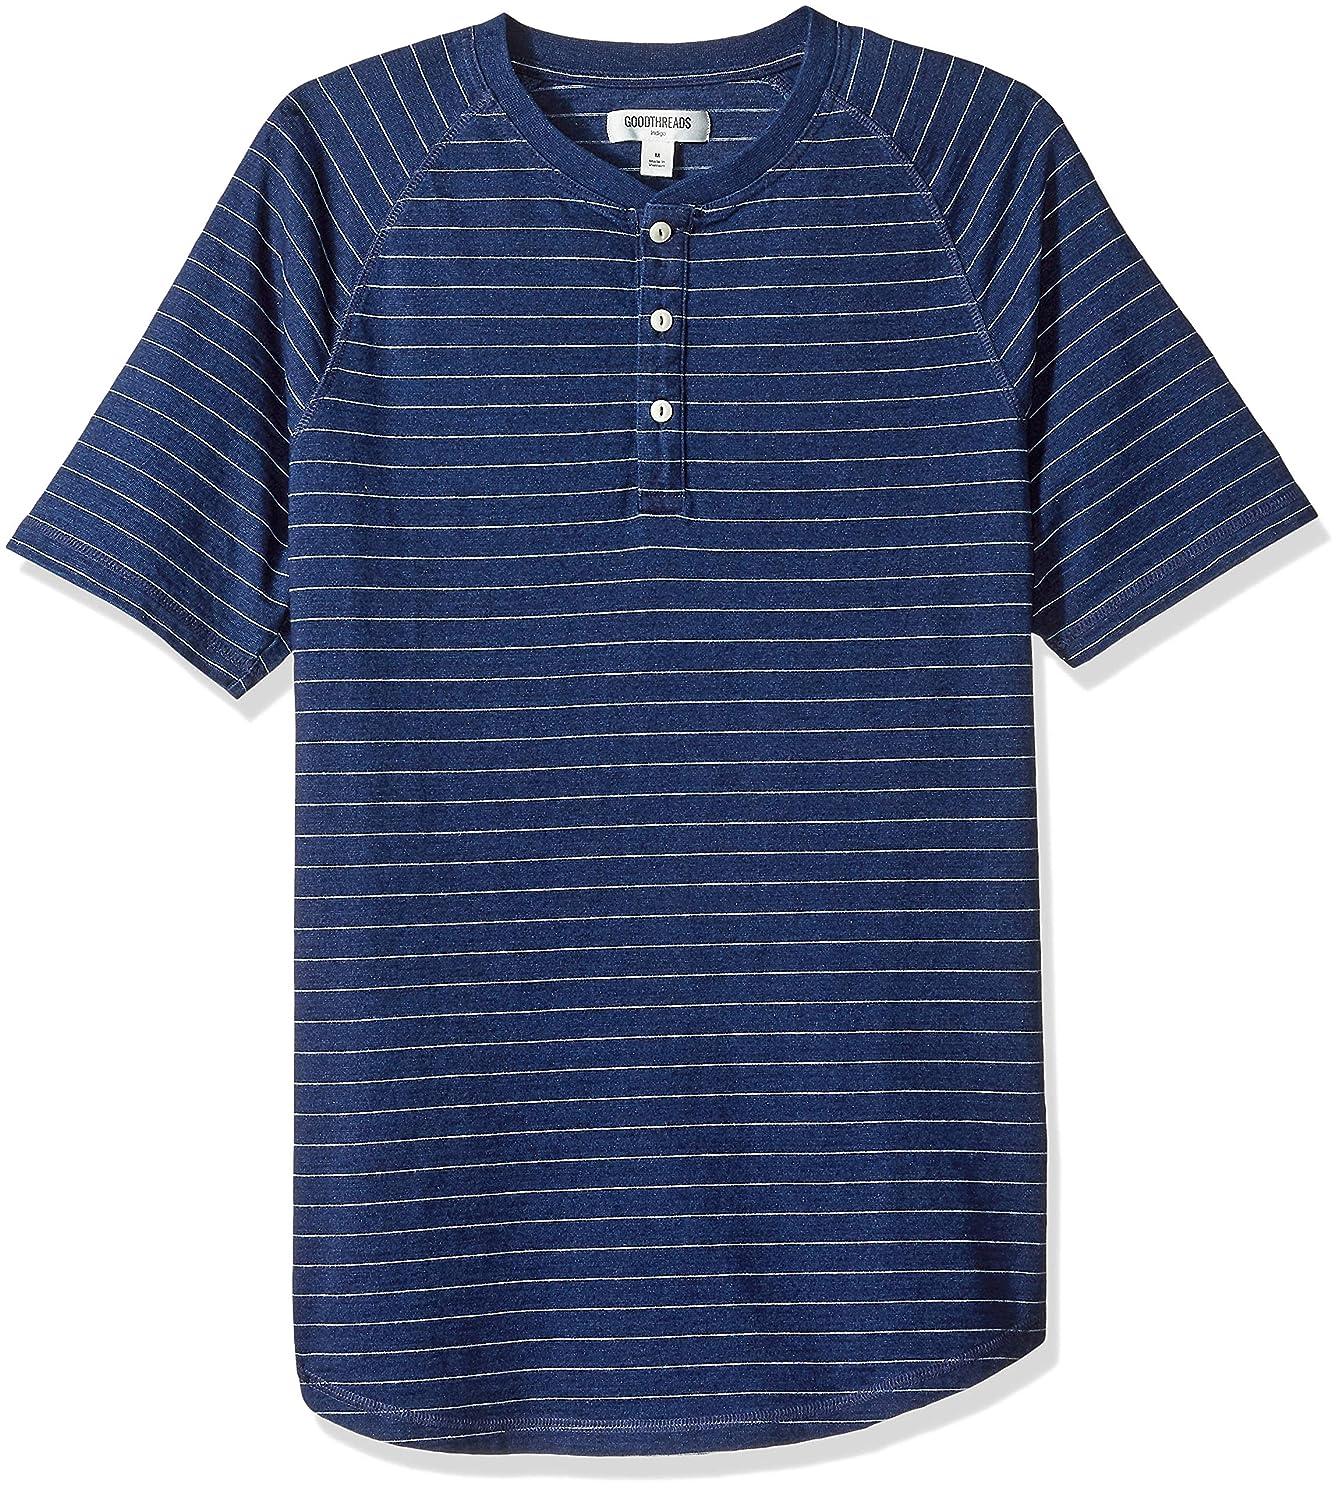 Amazon Brand - Goodthreads Men's Short-Sleeve Indigo Henley